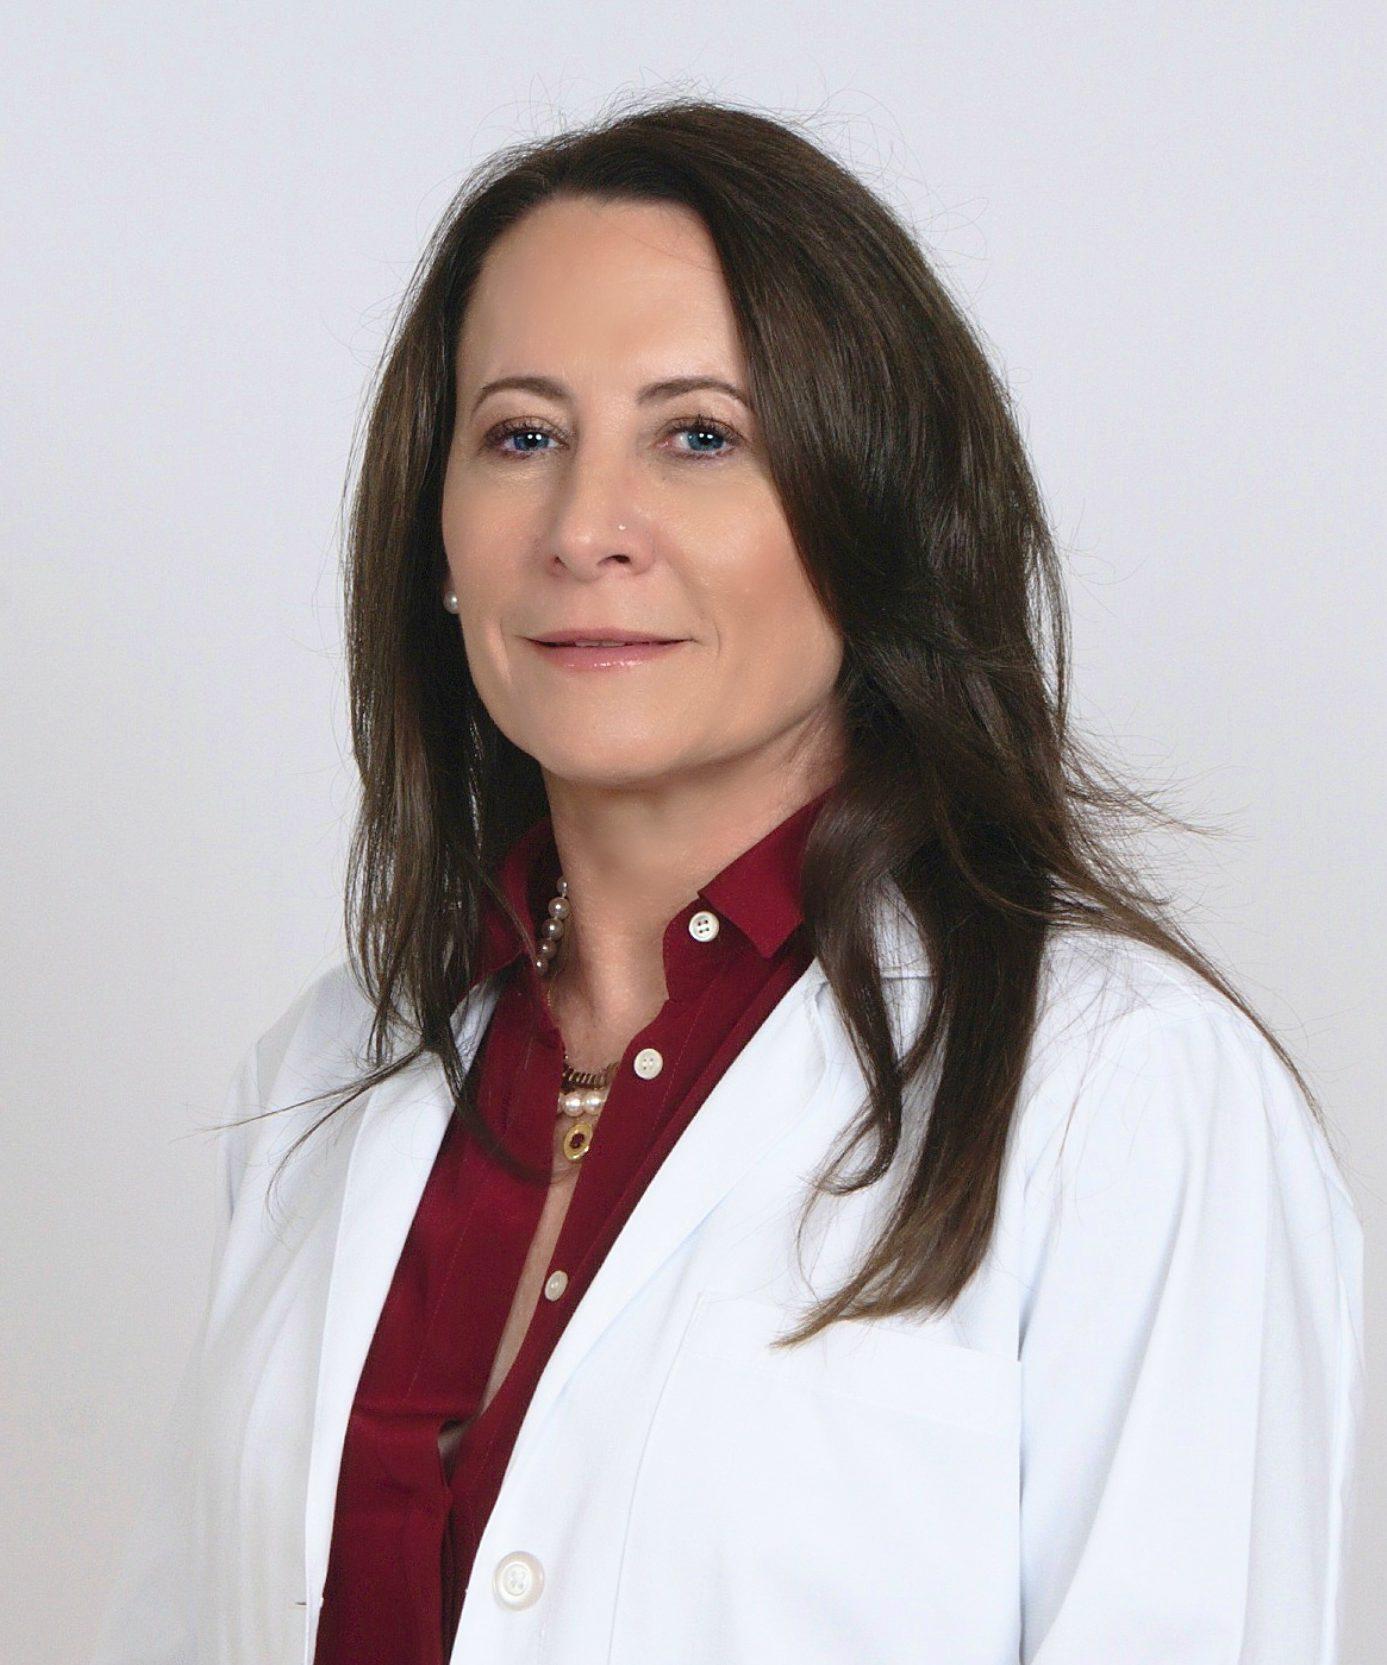 Dr. Janet Seper